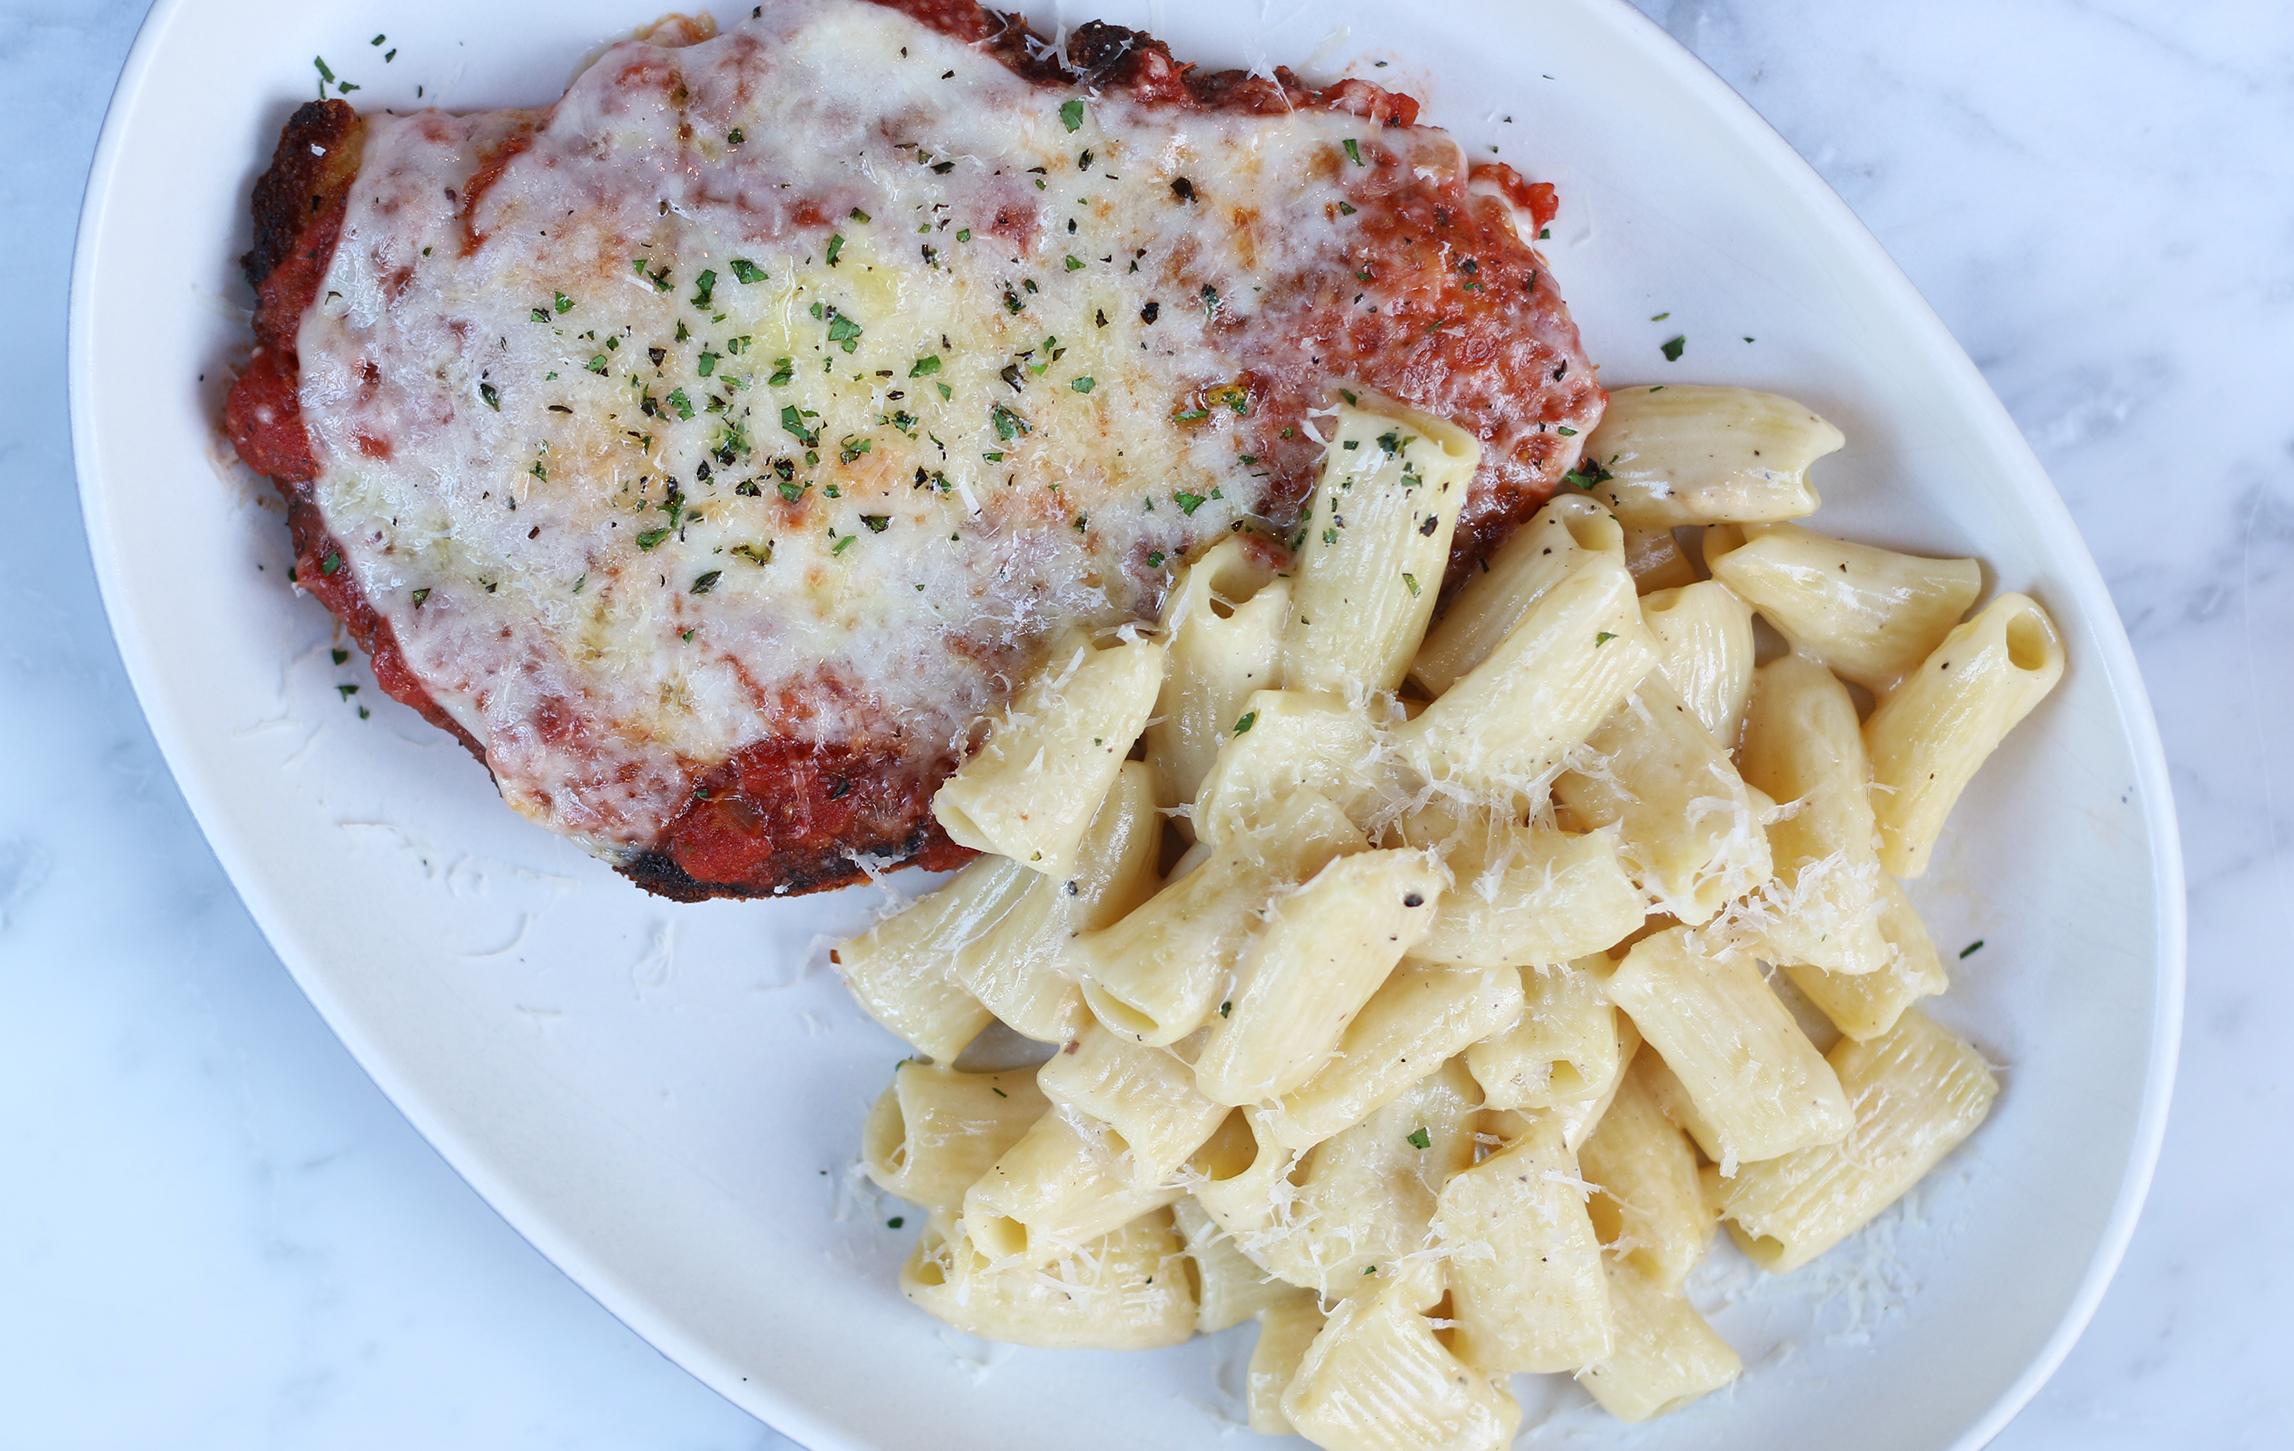 CHICKEN PARMESAN :crushed tomato, aged provolone, mozzarella, parmesan rigatoni